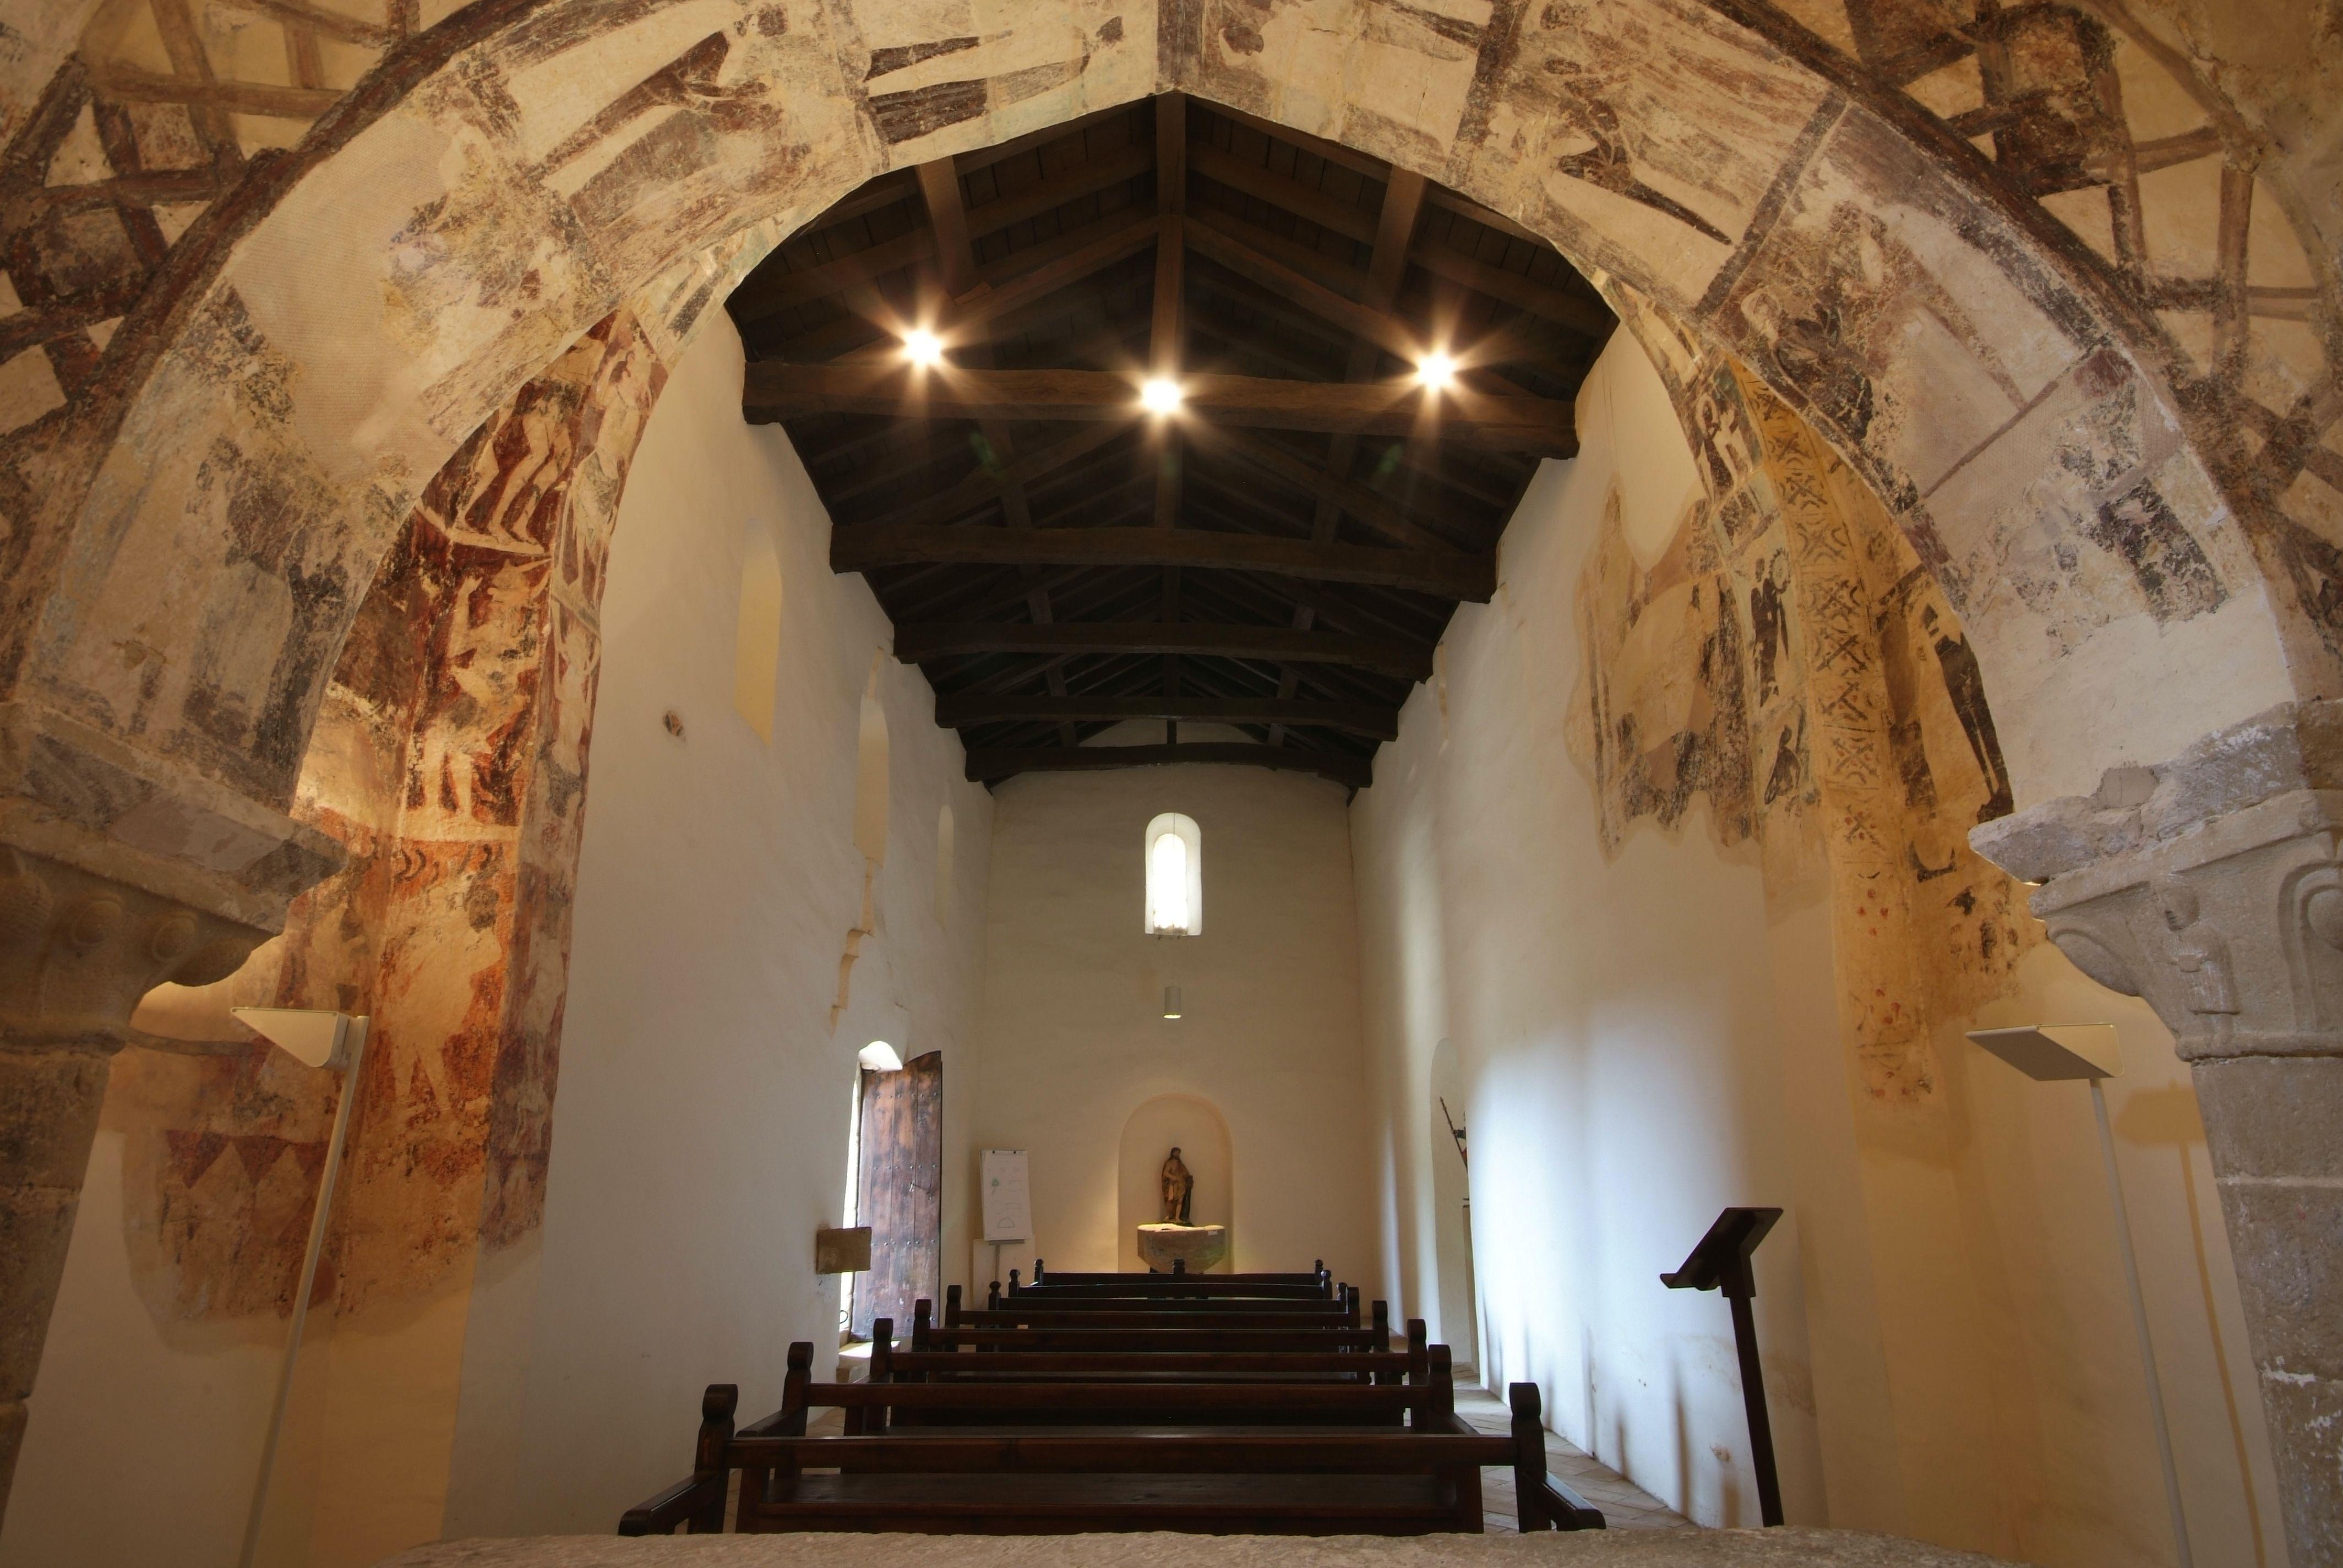 Imagen del interior de la iglesia pre-románica de Eristain con sus frescos